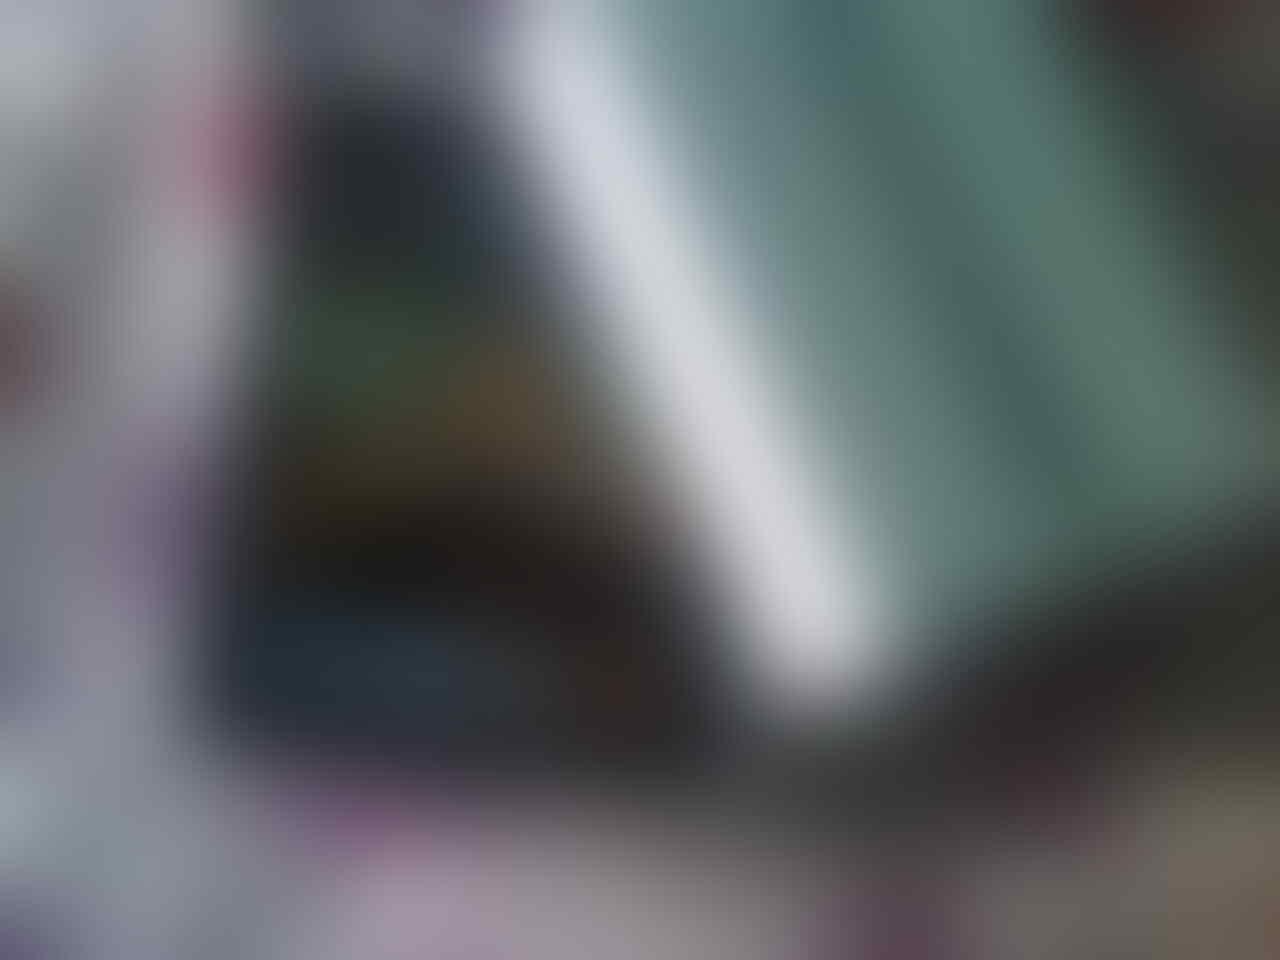 iPhone 4S 16GB White Fullset Mulus kinyis kinyis murah aja gan